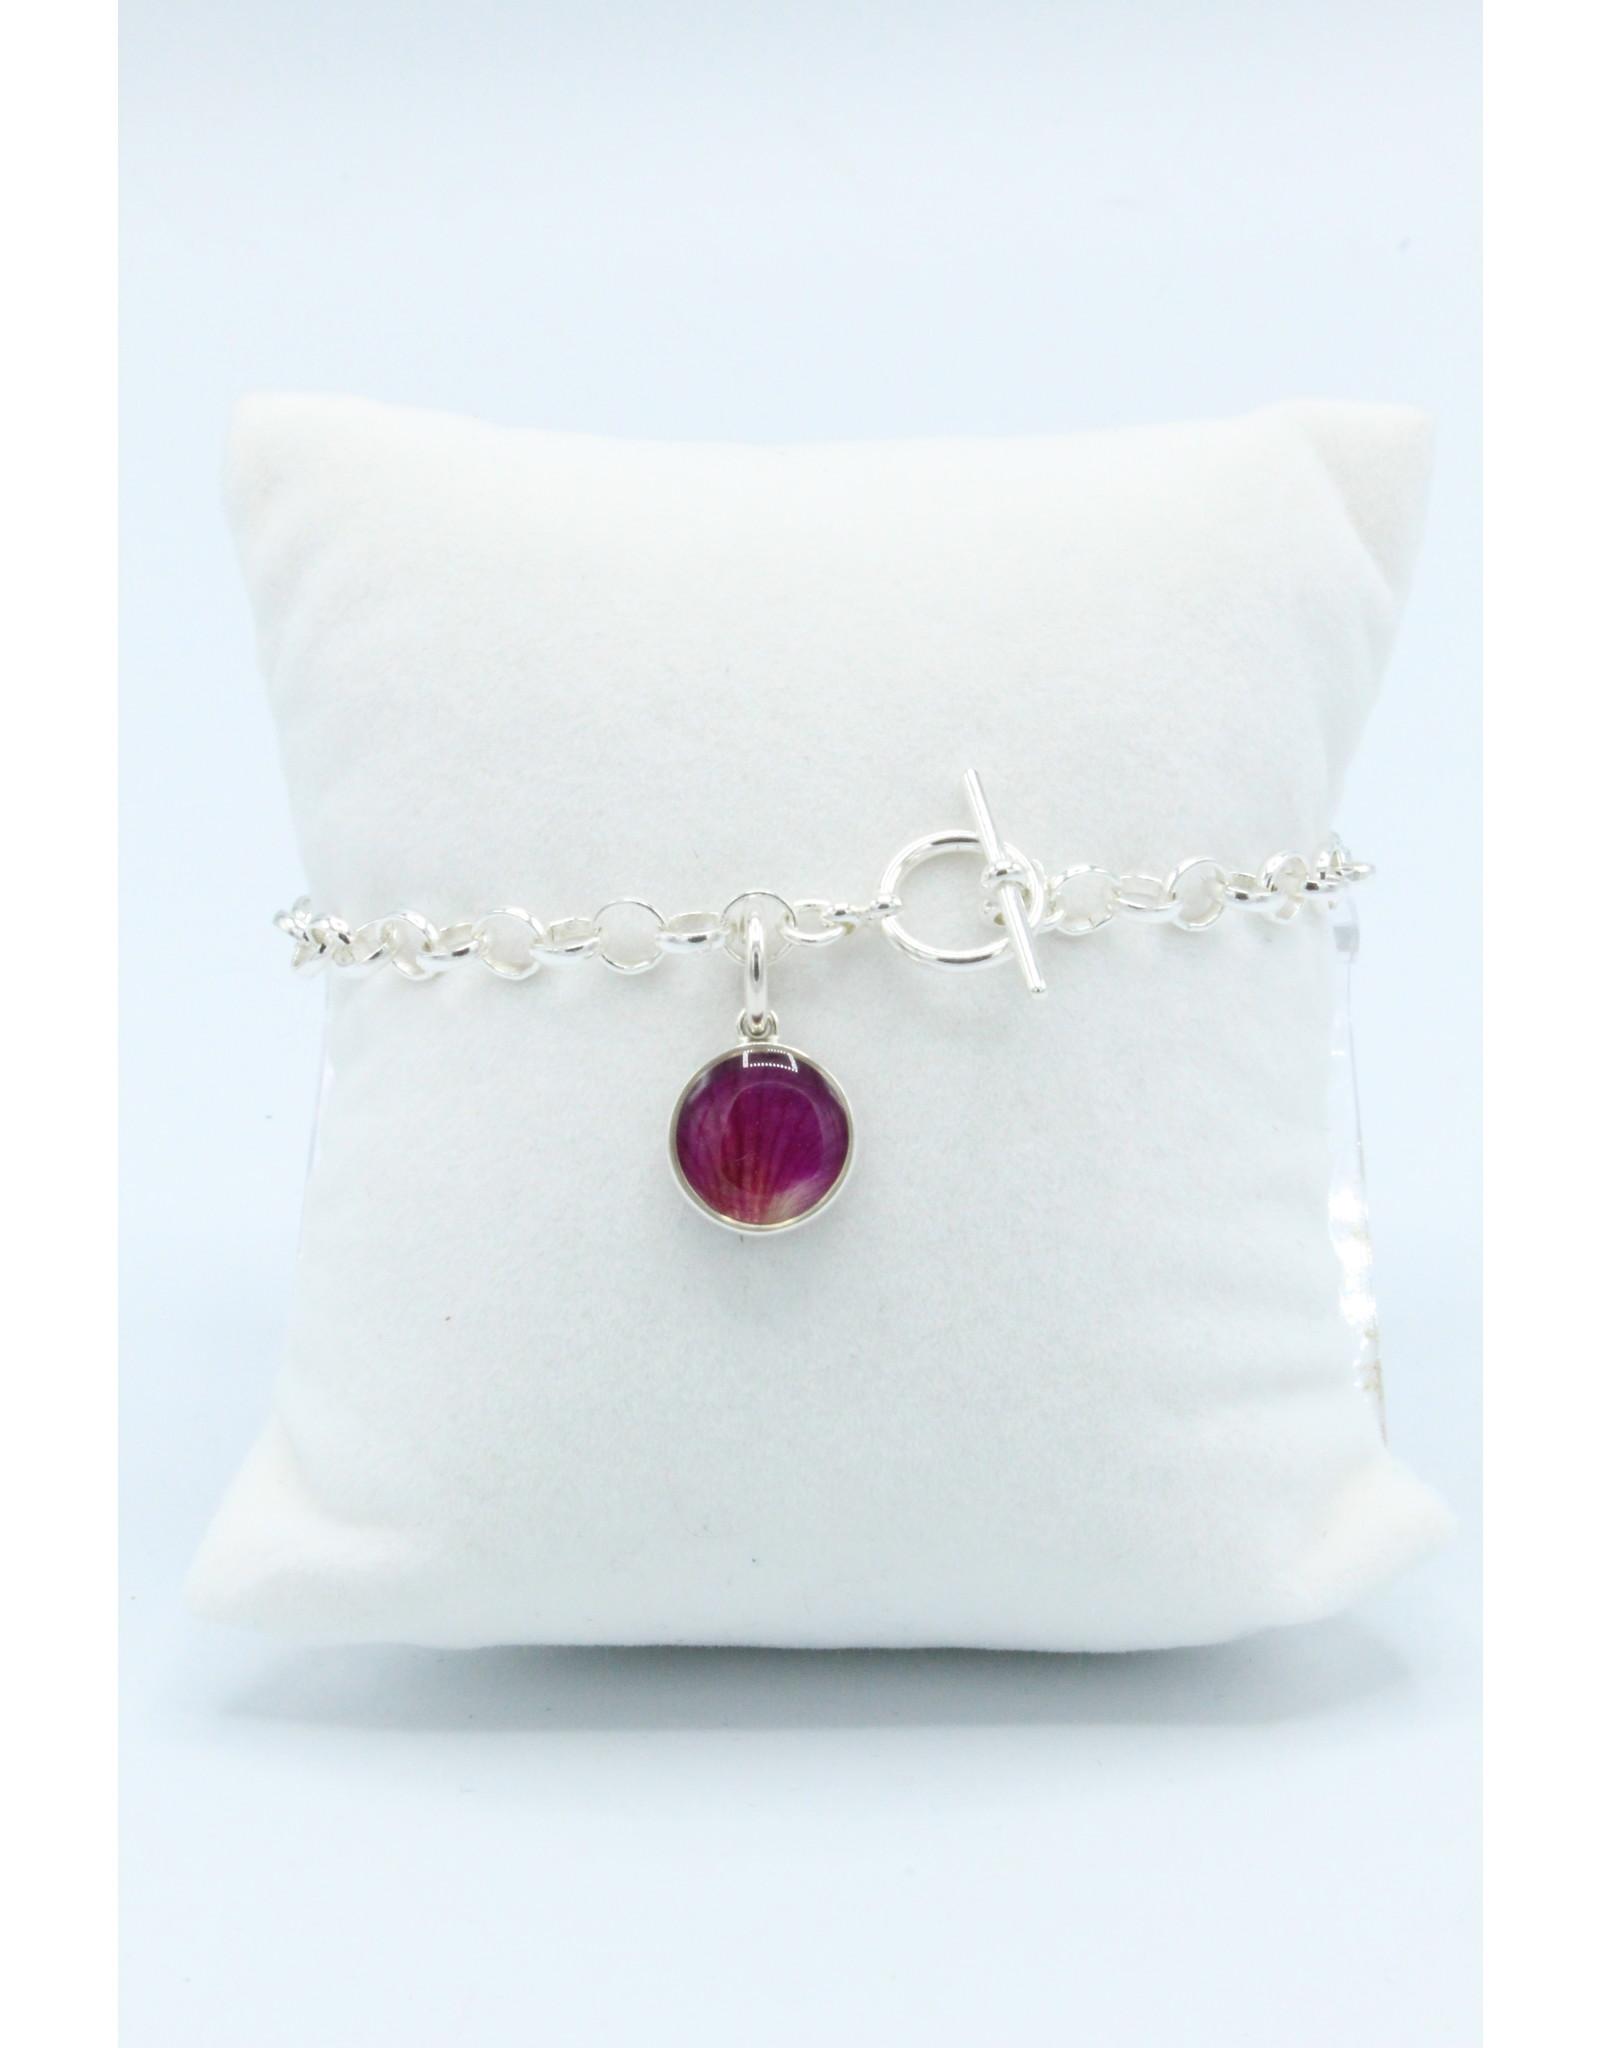 Alberta Wild Rose Silver Bracelet - AB02T